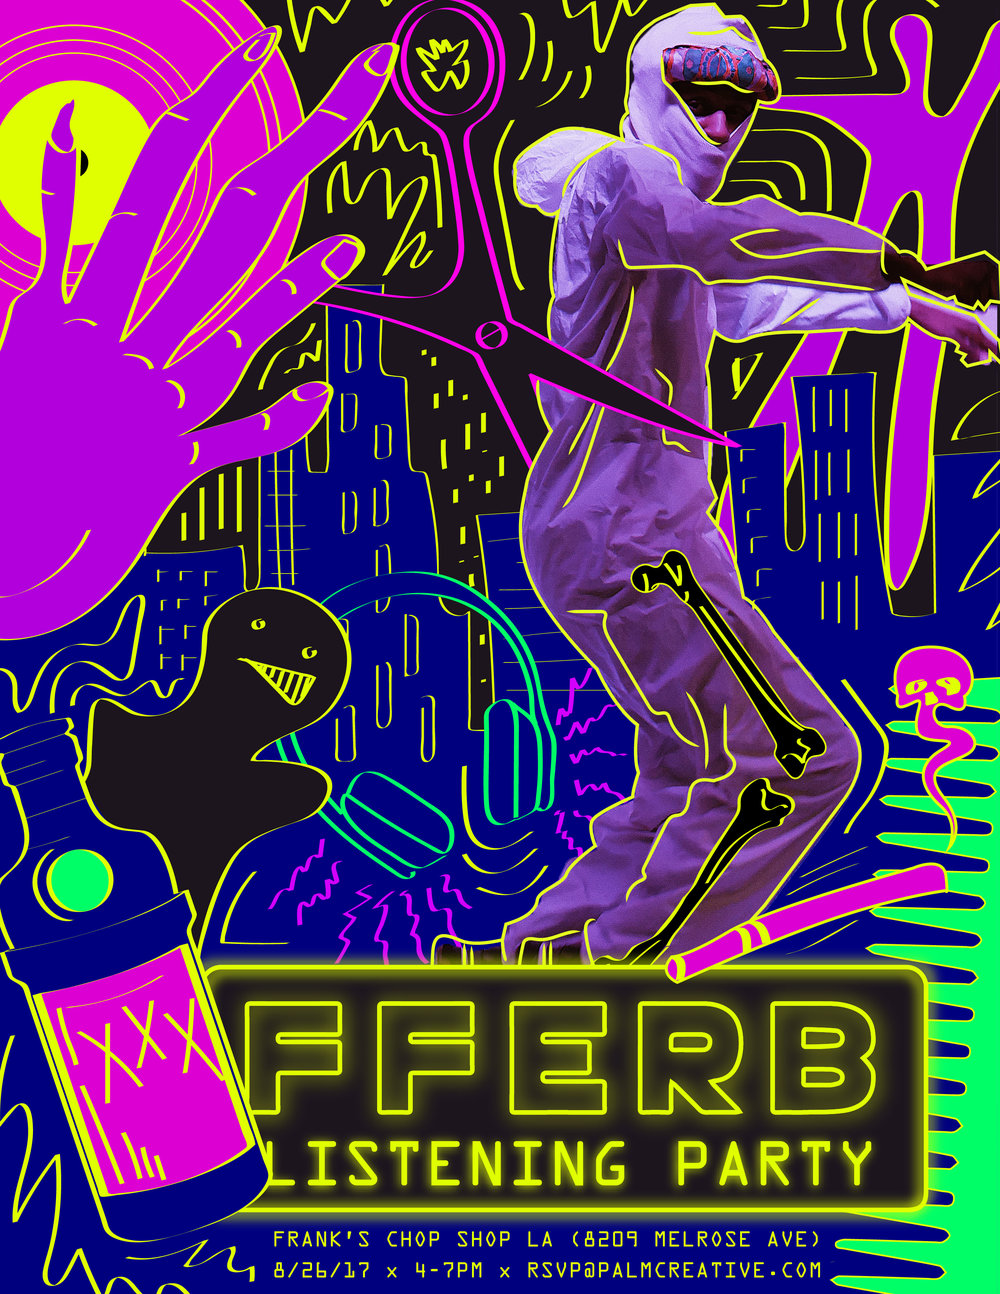 FFERB_ListeningParty.jpg